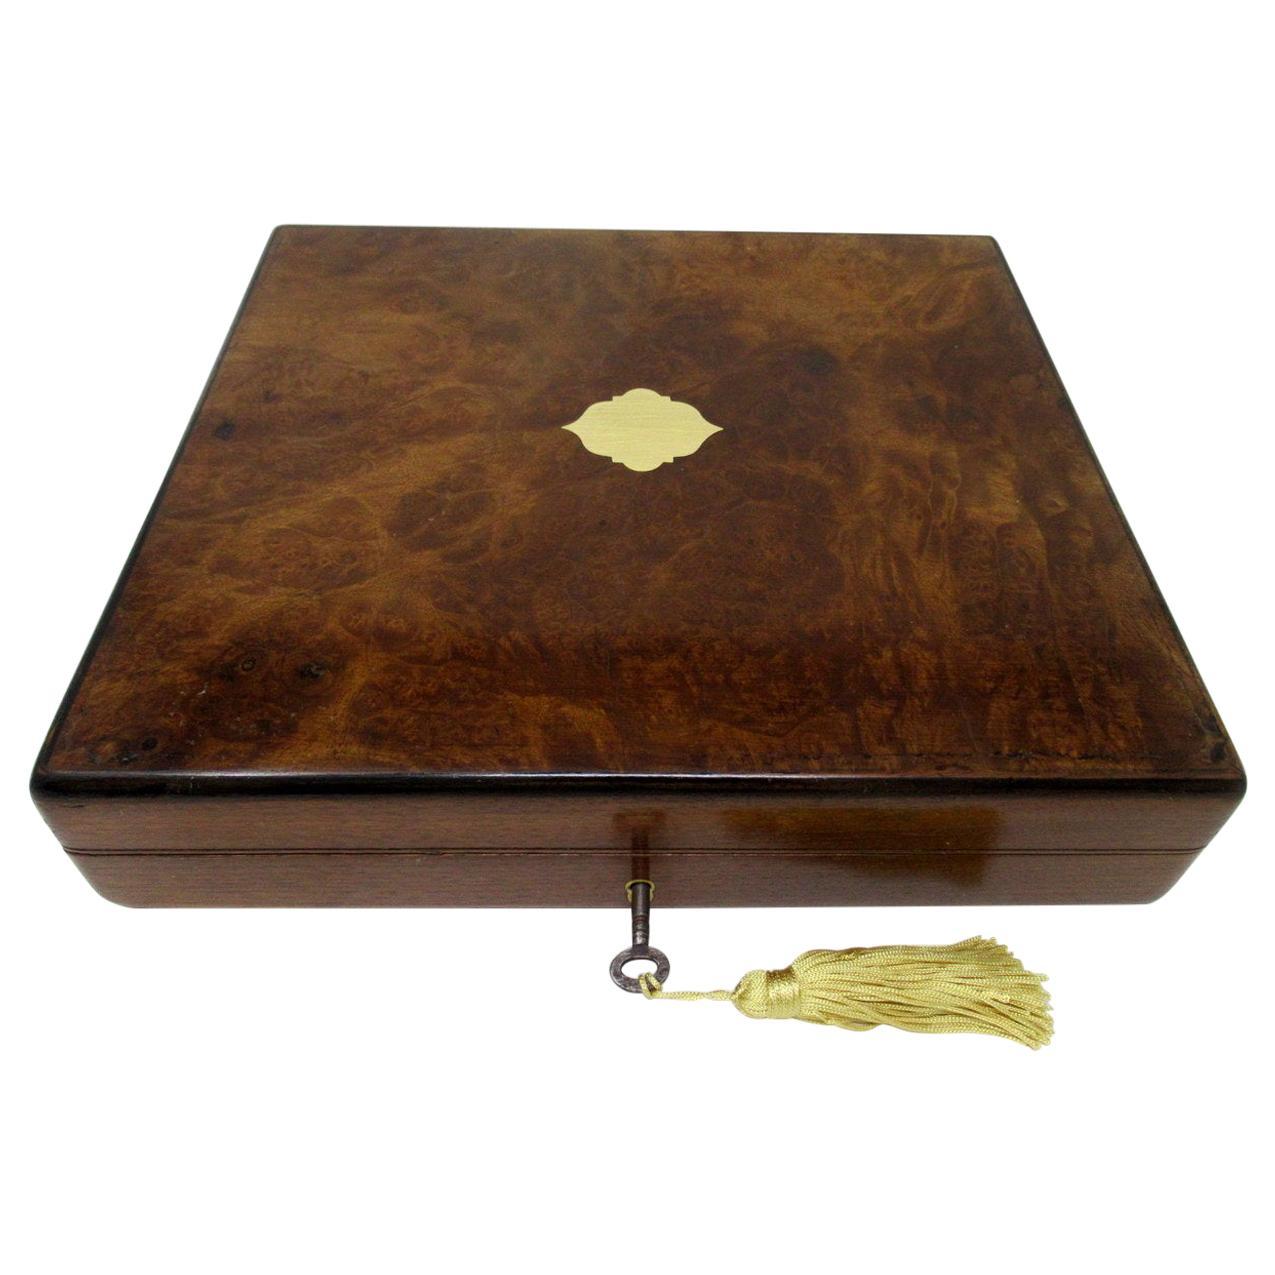 Antique Vintage Burl Burr Walnut Wooden Jewelry or Cigar Box Casket Provenace